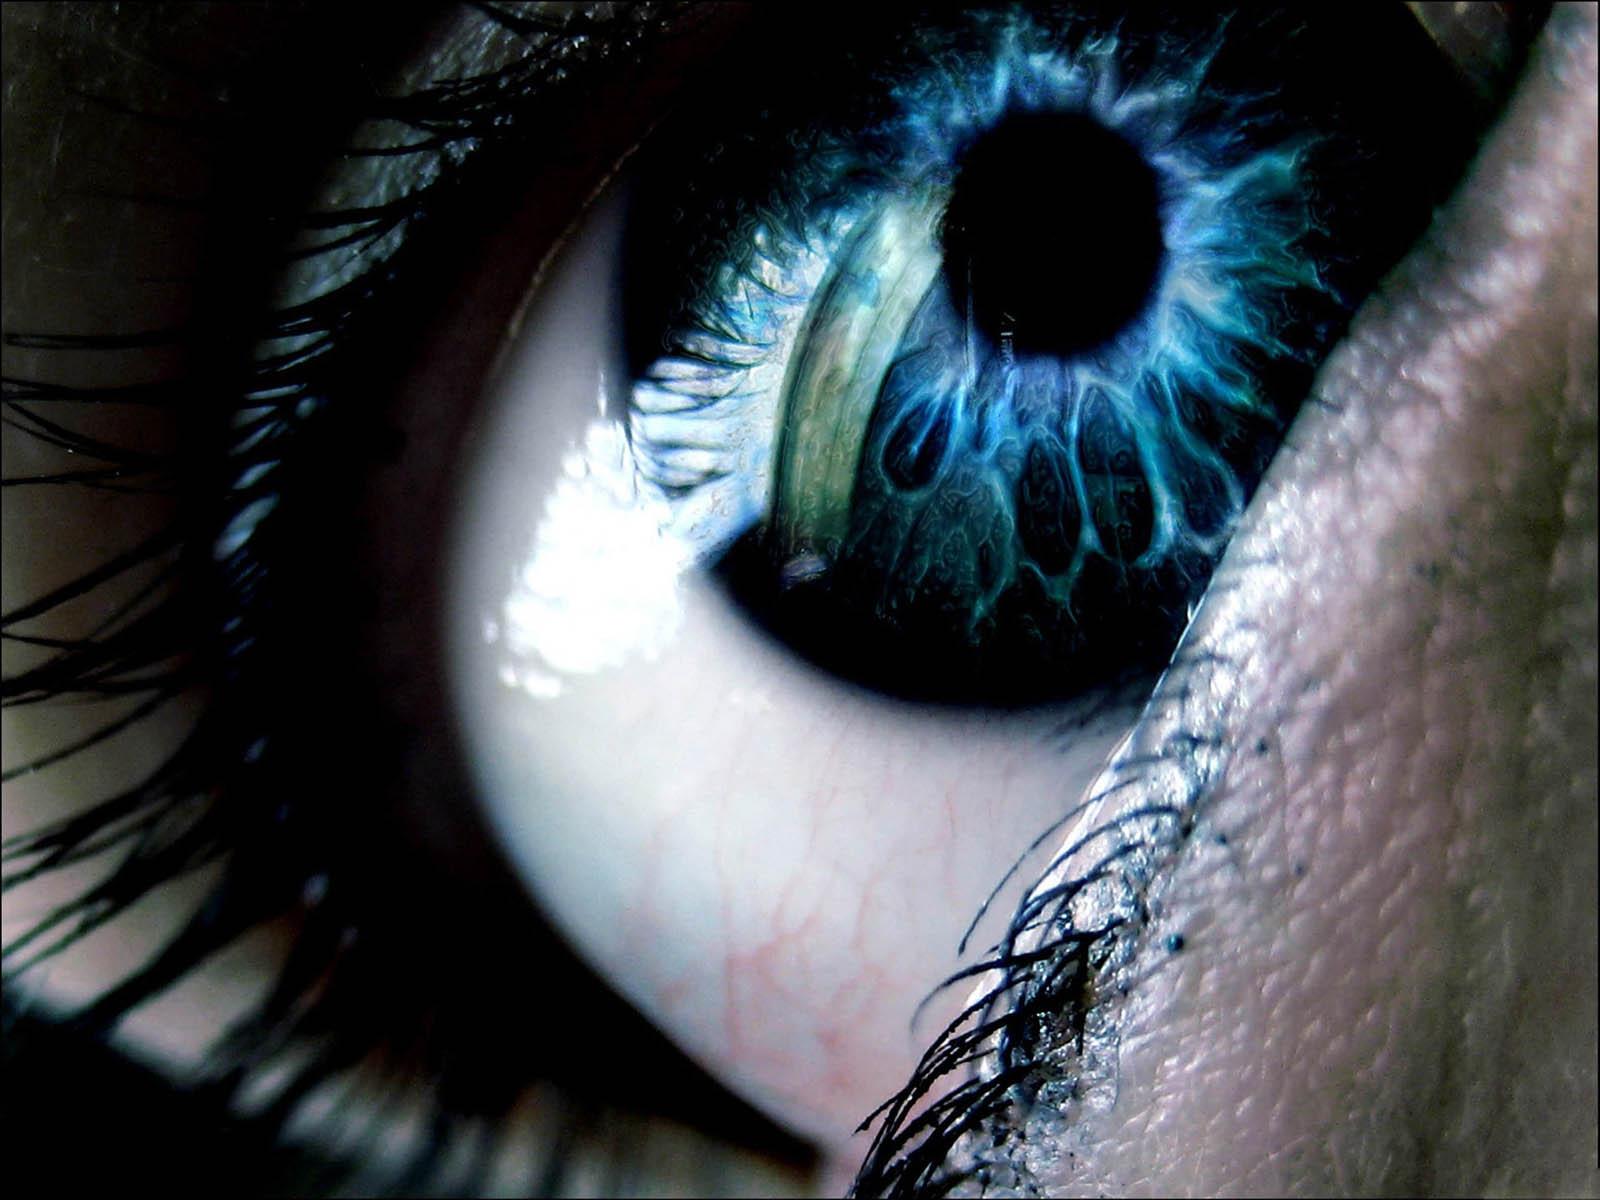 Eye Wallpapers 3D Eye Desktop Wallpapers 3D Eye Desktop Backgrounds 1600x1200